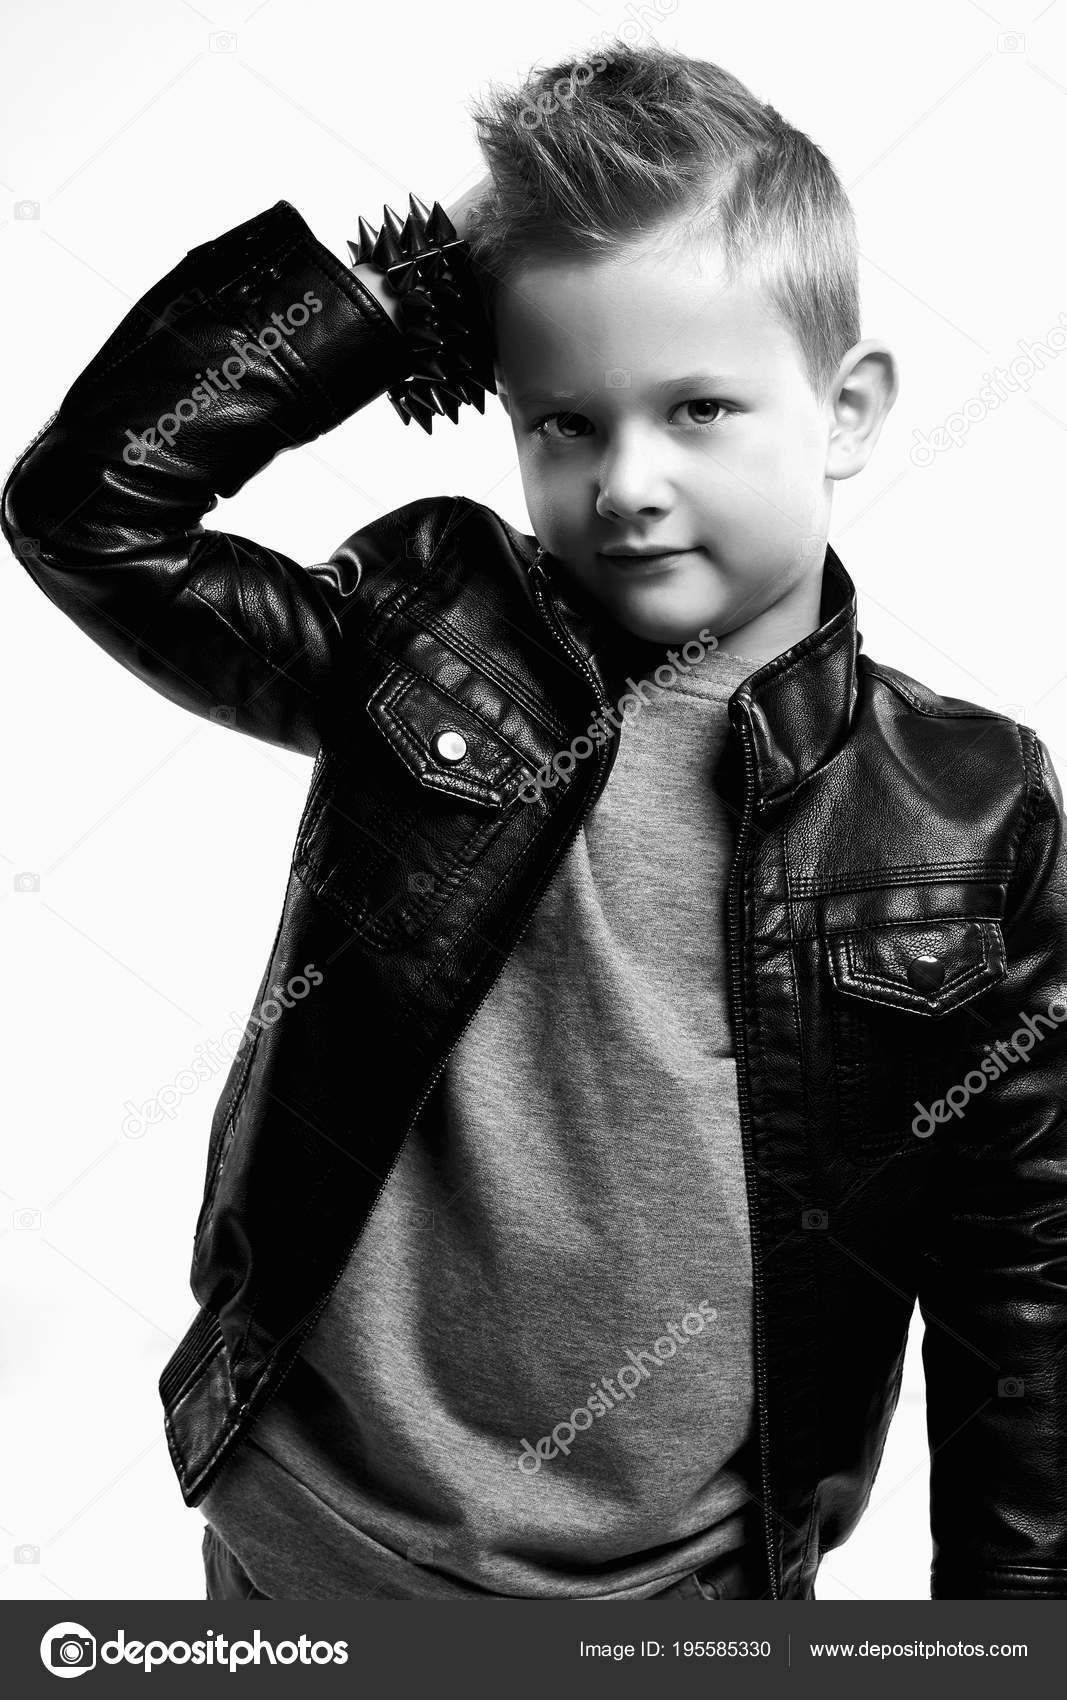 82a7530bbb0 Μοντέρνα παιδί σε Δερμάτινα παλτό. κομψό μικρό αγόρι με trendy κούρεμα.  Μαύρο και άσπρο μόδα πορτρέτο — Εικόνα από ...